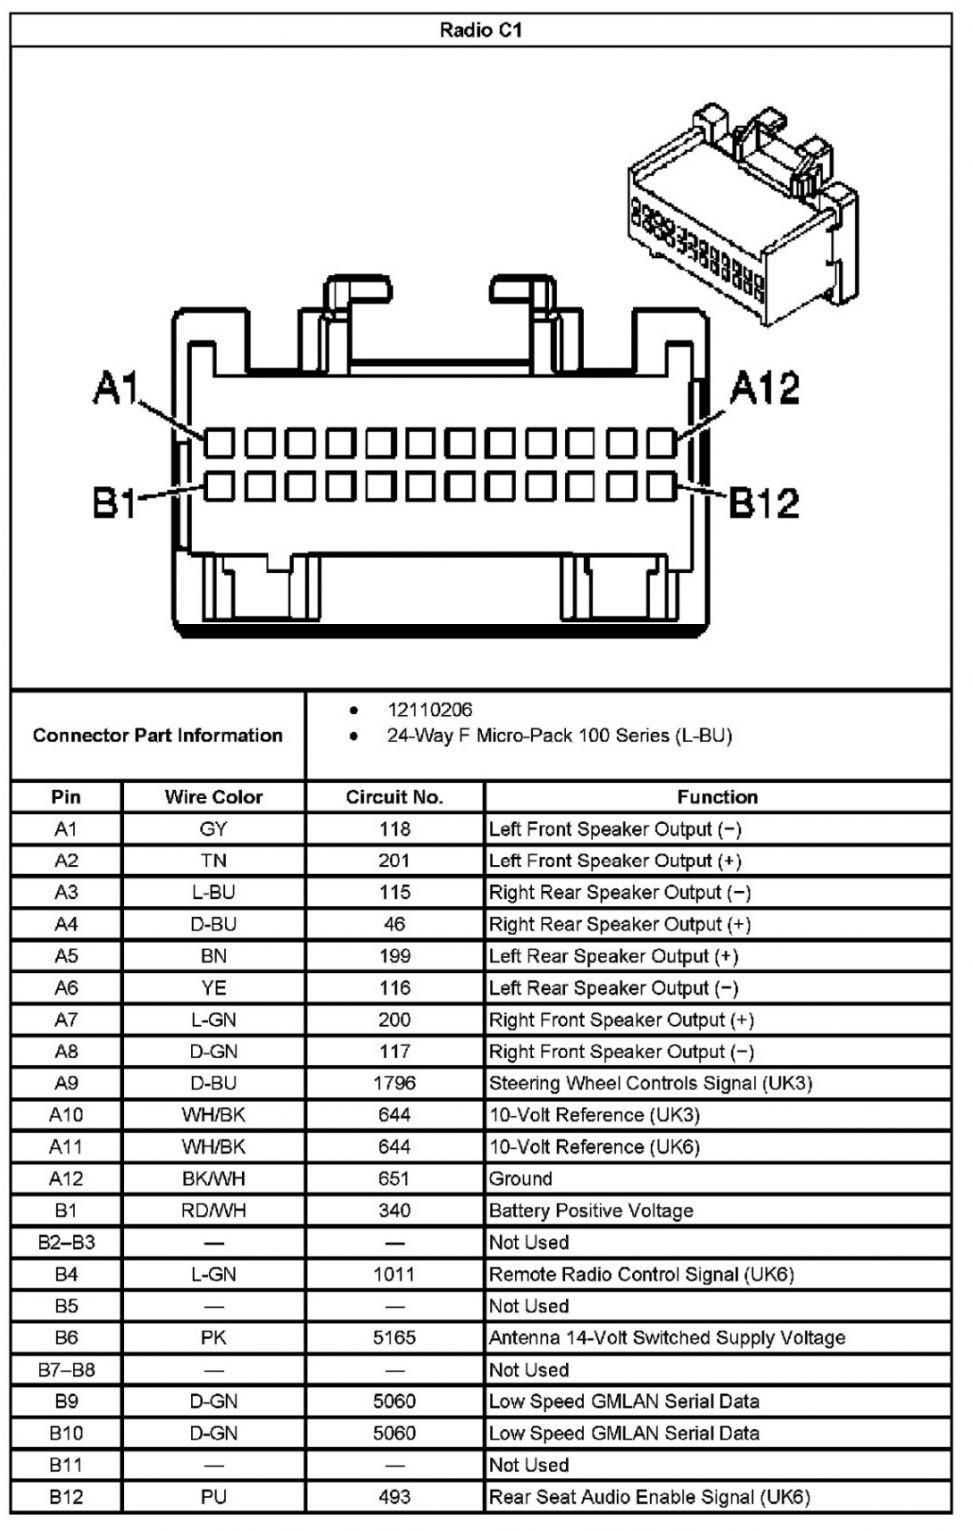 2004 Malibu Stereo Wiring Diagram - Trailer Hitch Wiring Diagram 7 Pin for Wiring  Diagram SchematicsWiring Diagram Schematics